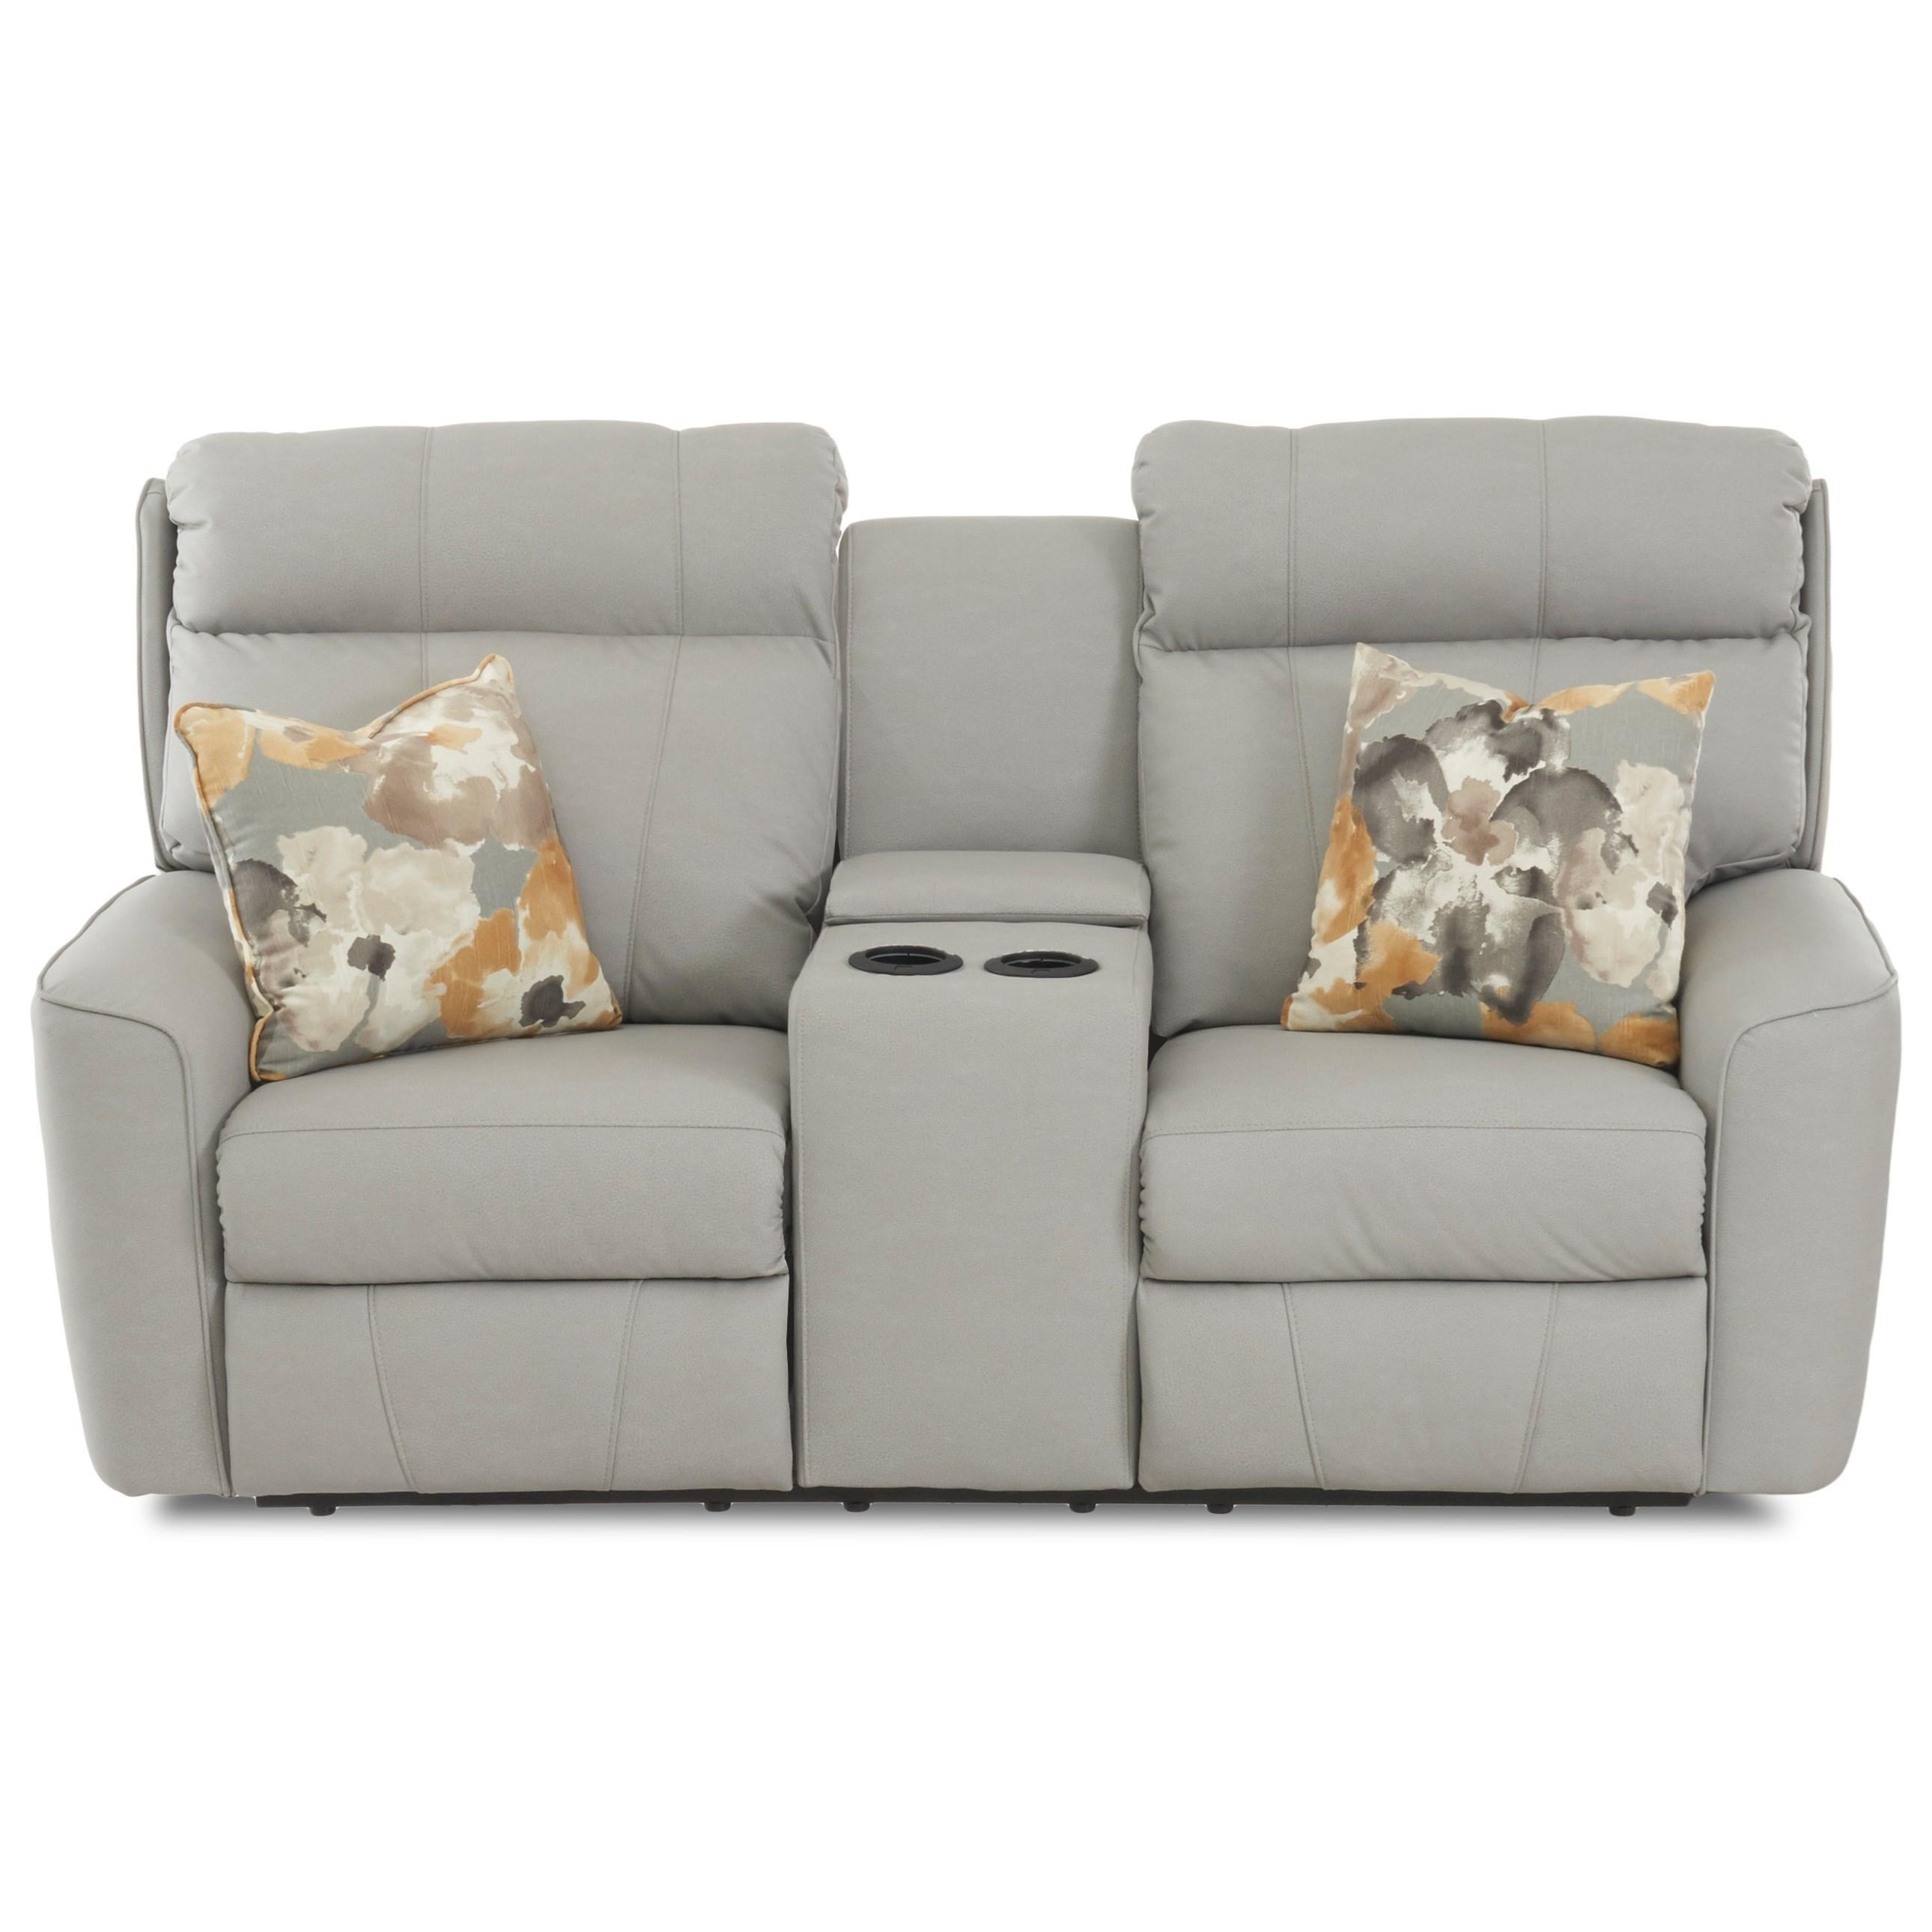 Elara Console Reclining Loveseat w/ Pillows by Klaussner at Lapeer Furniture & Mattress Center